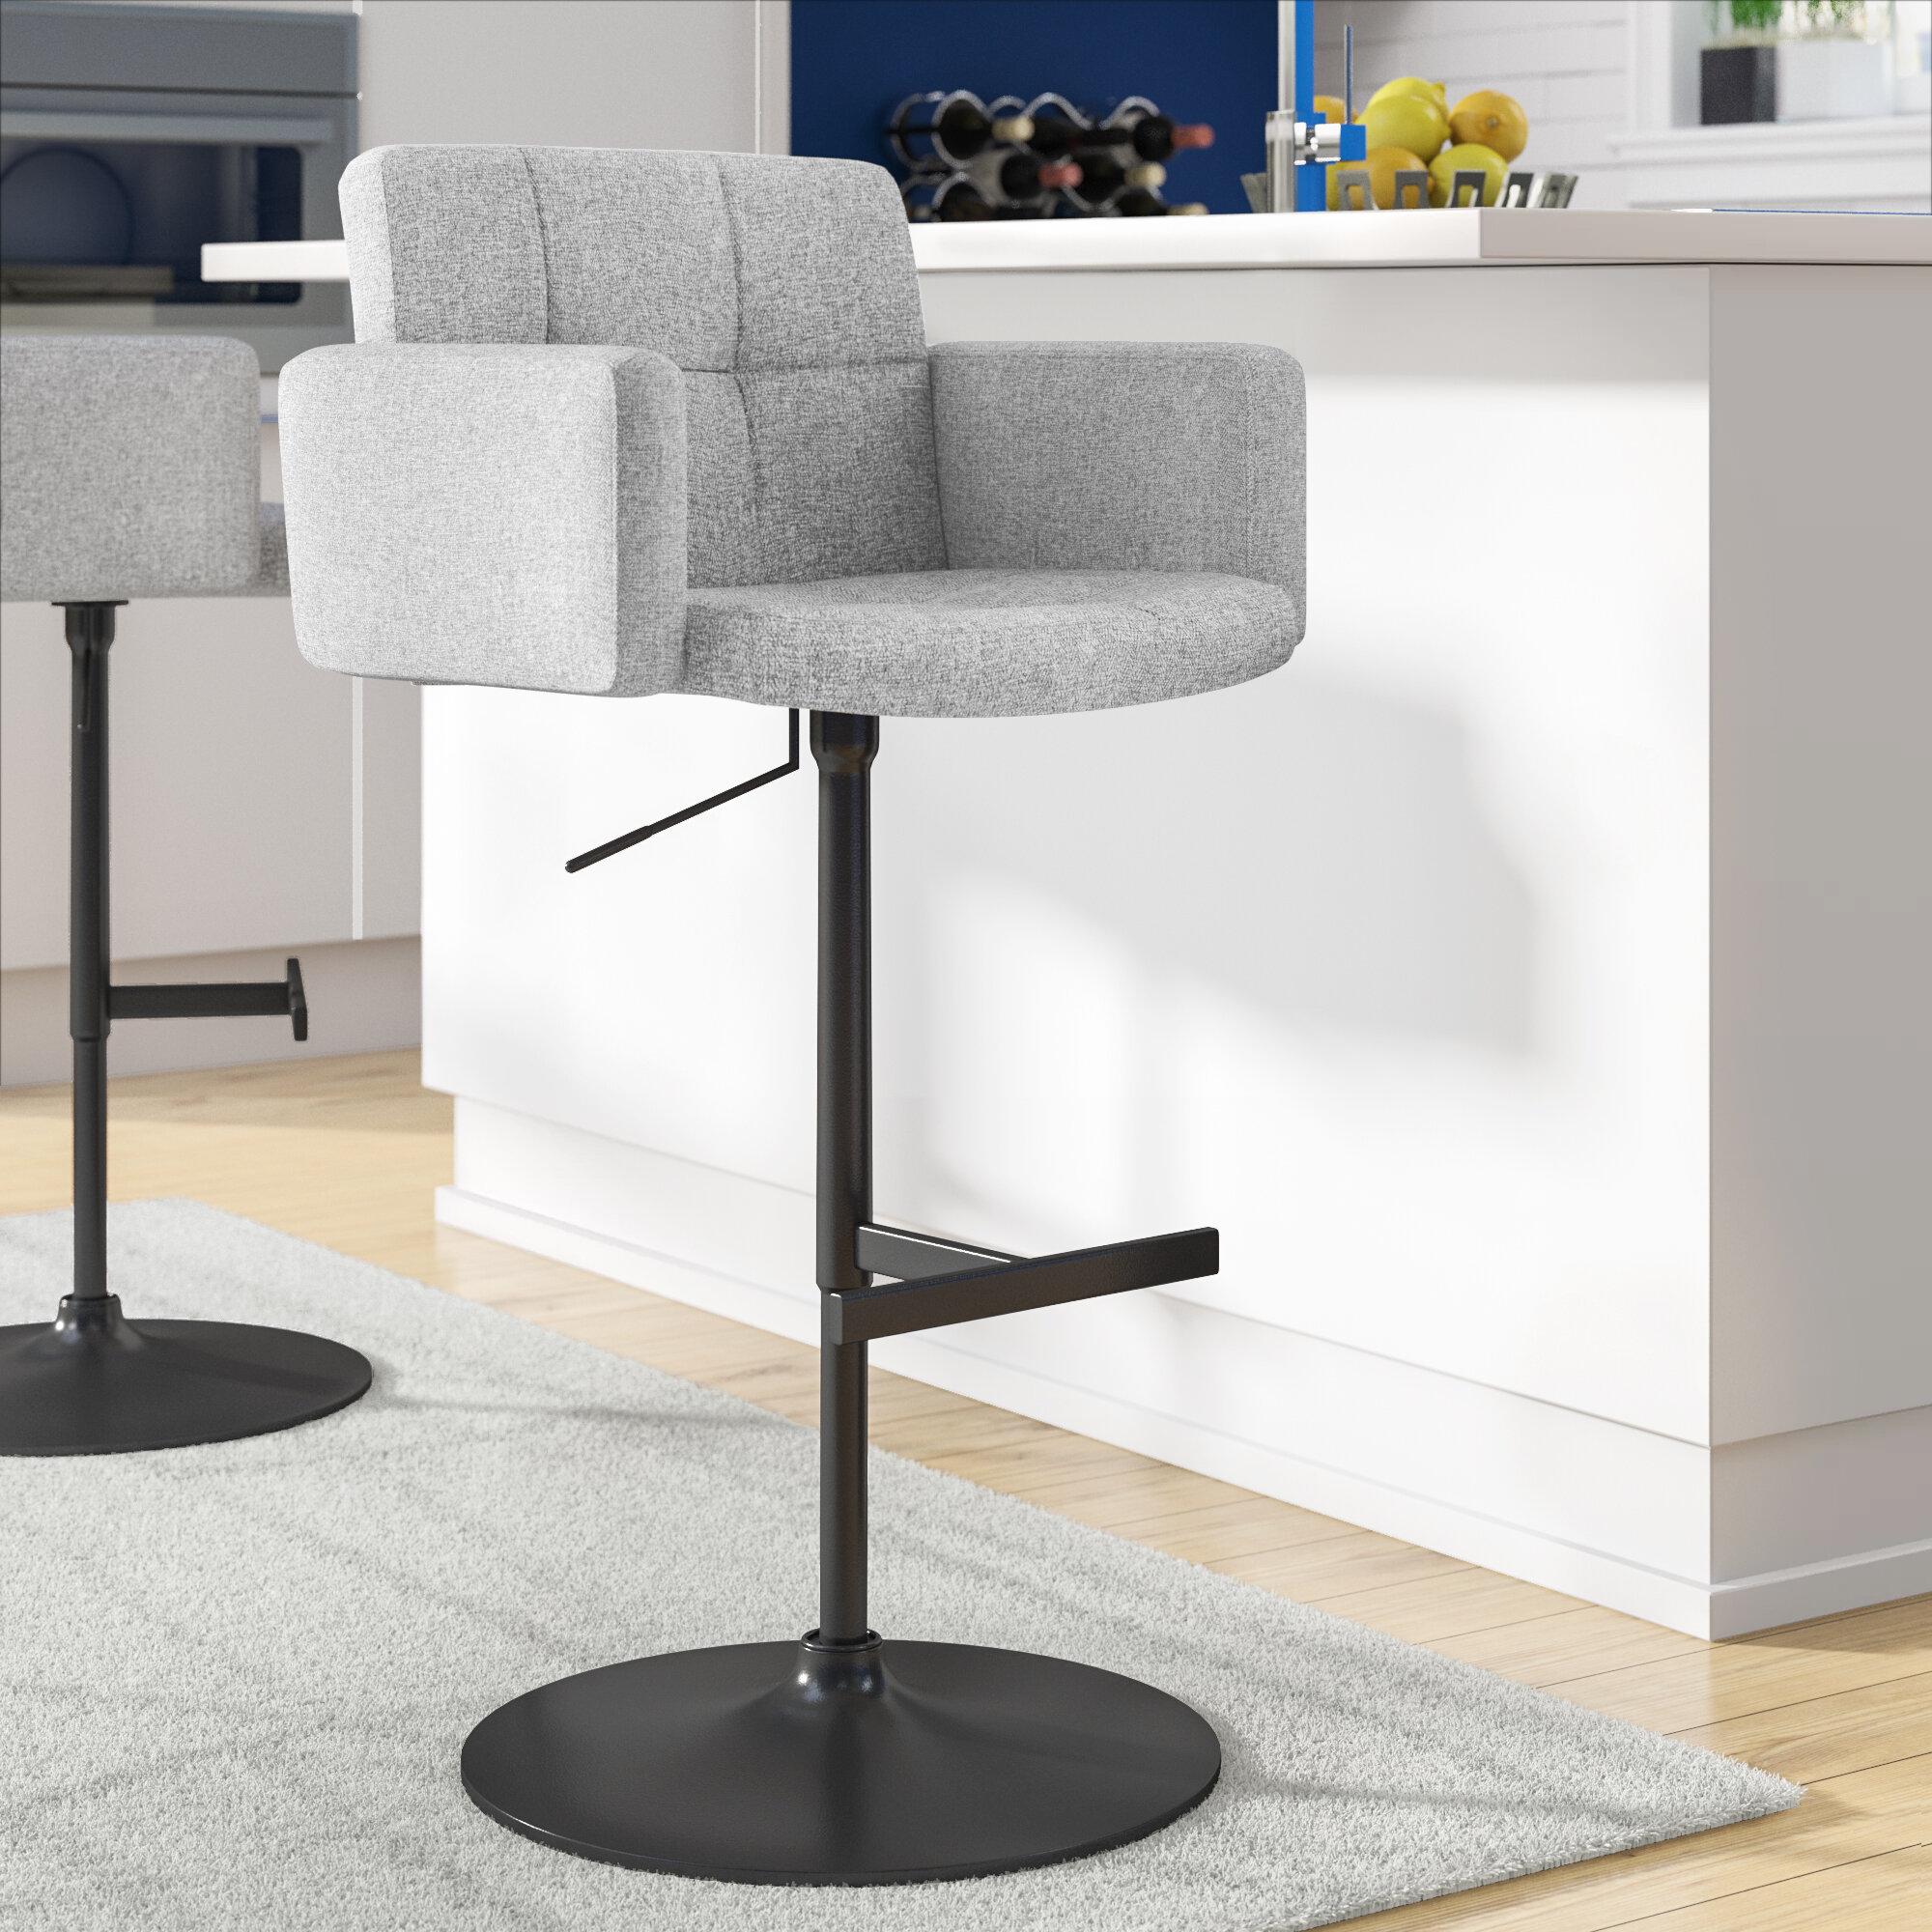 Stupendous Earleville Adjustable Height Swivel Bar Stool Cjindustries Chair Design For Home Cjindustriesco